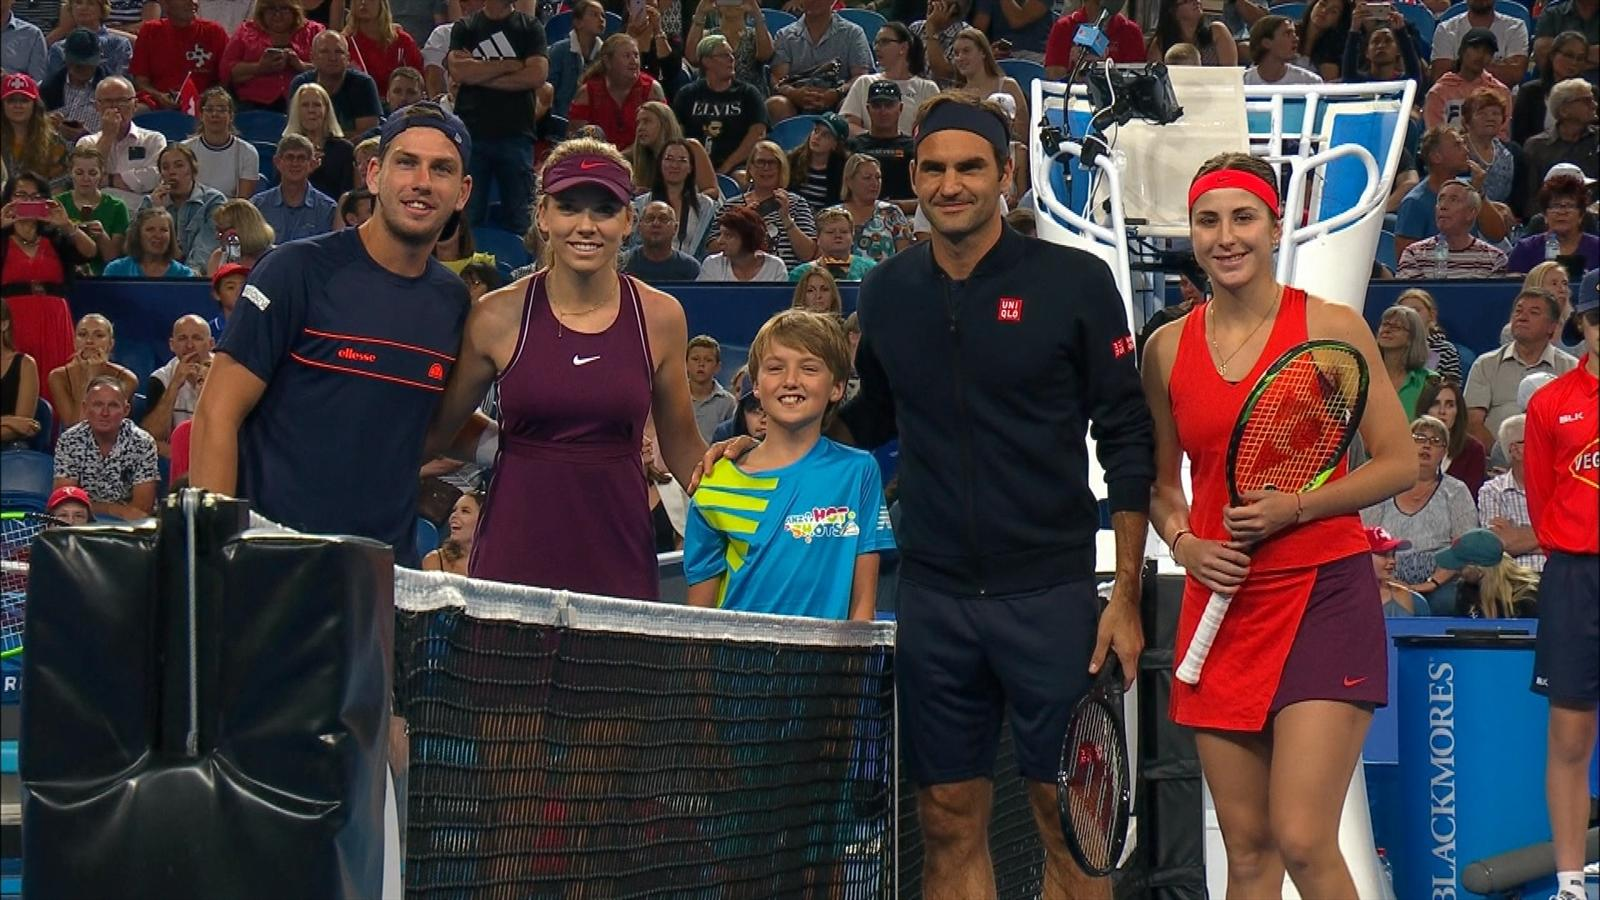 Video Tennis News No Surprise Ball Kid Chooses Roger Federer